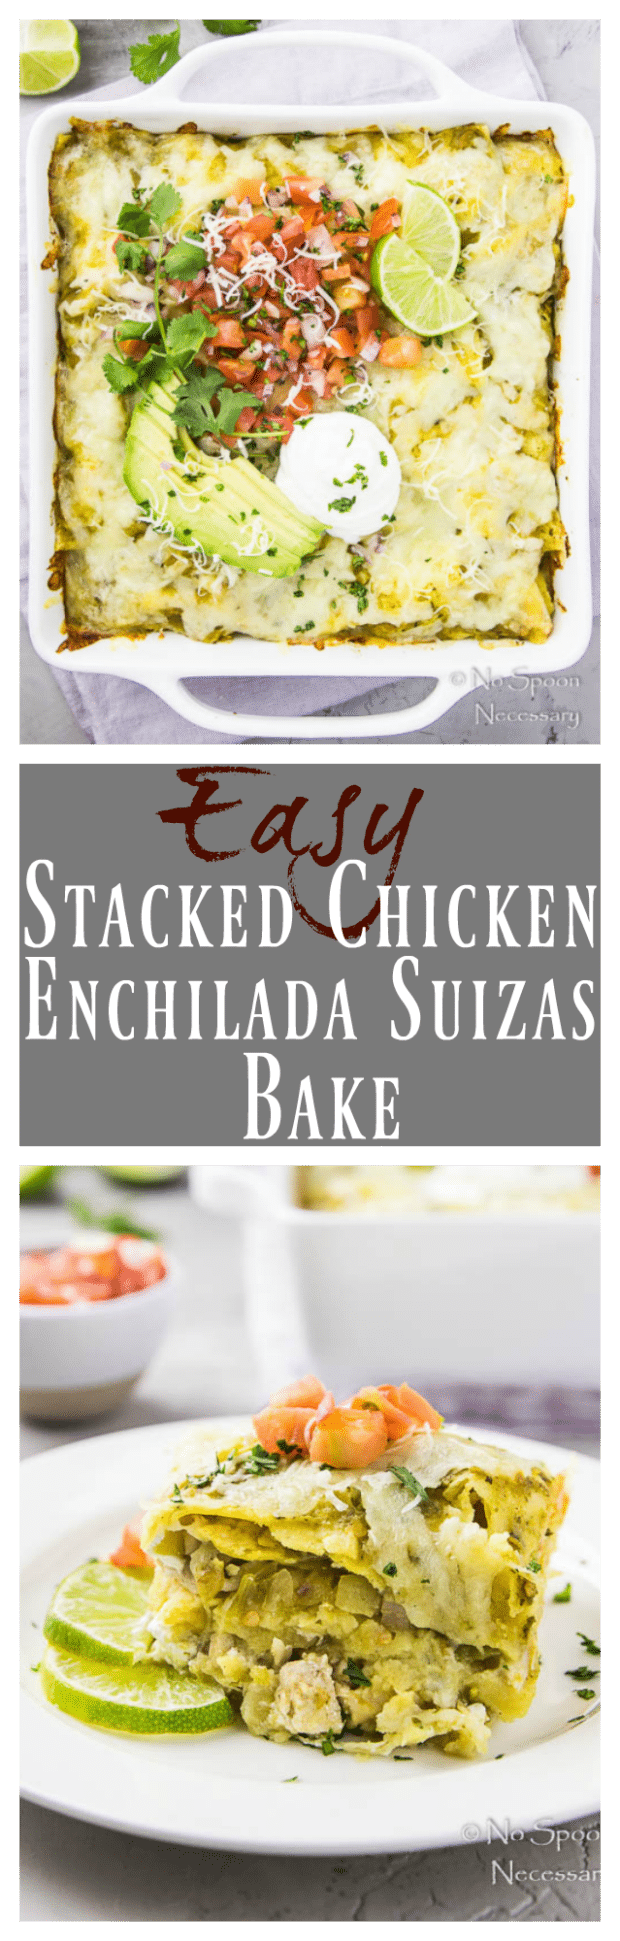 Easy Stacked Enchilada Suizas Bake